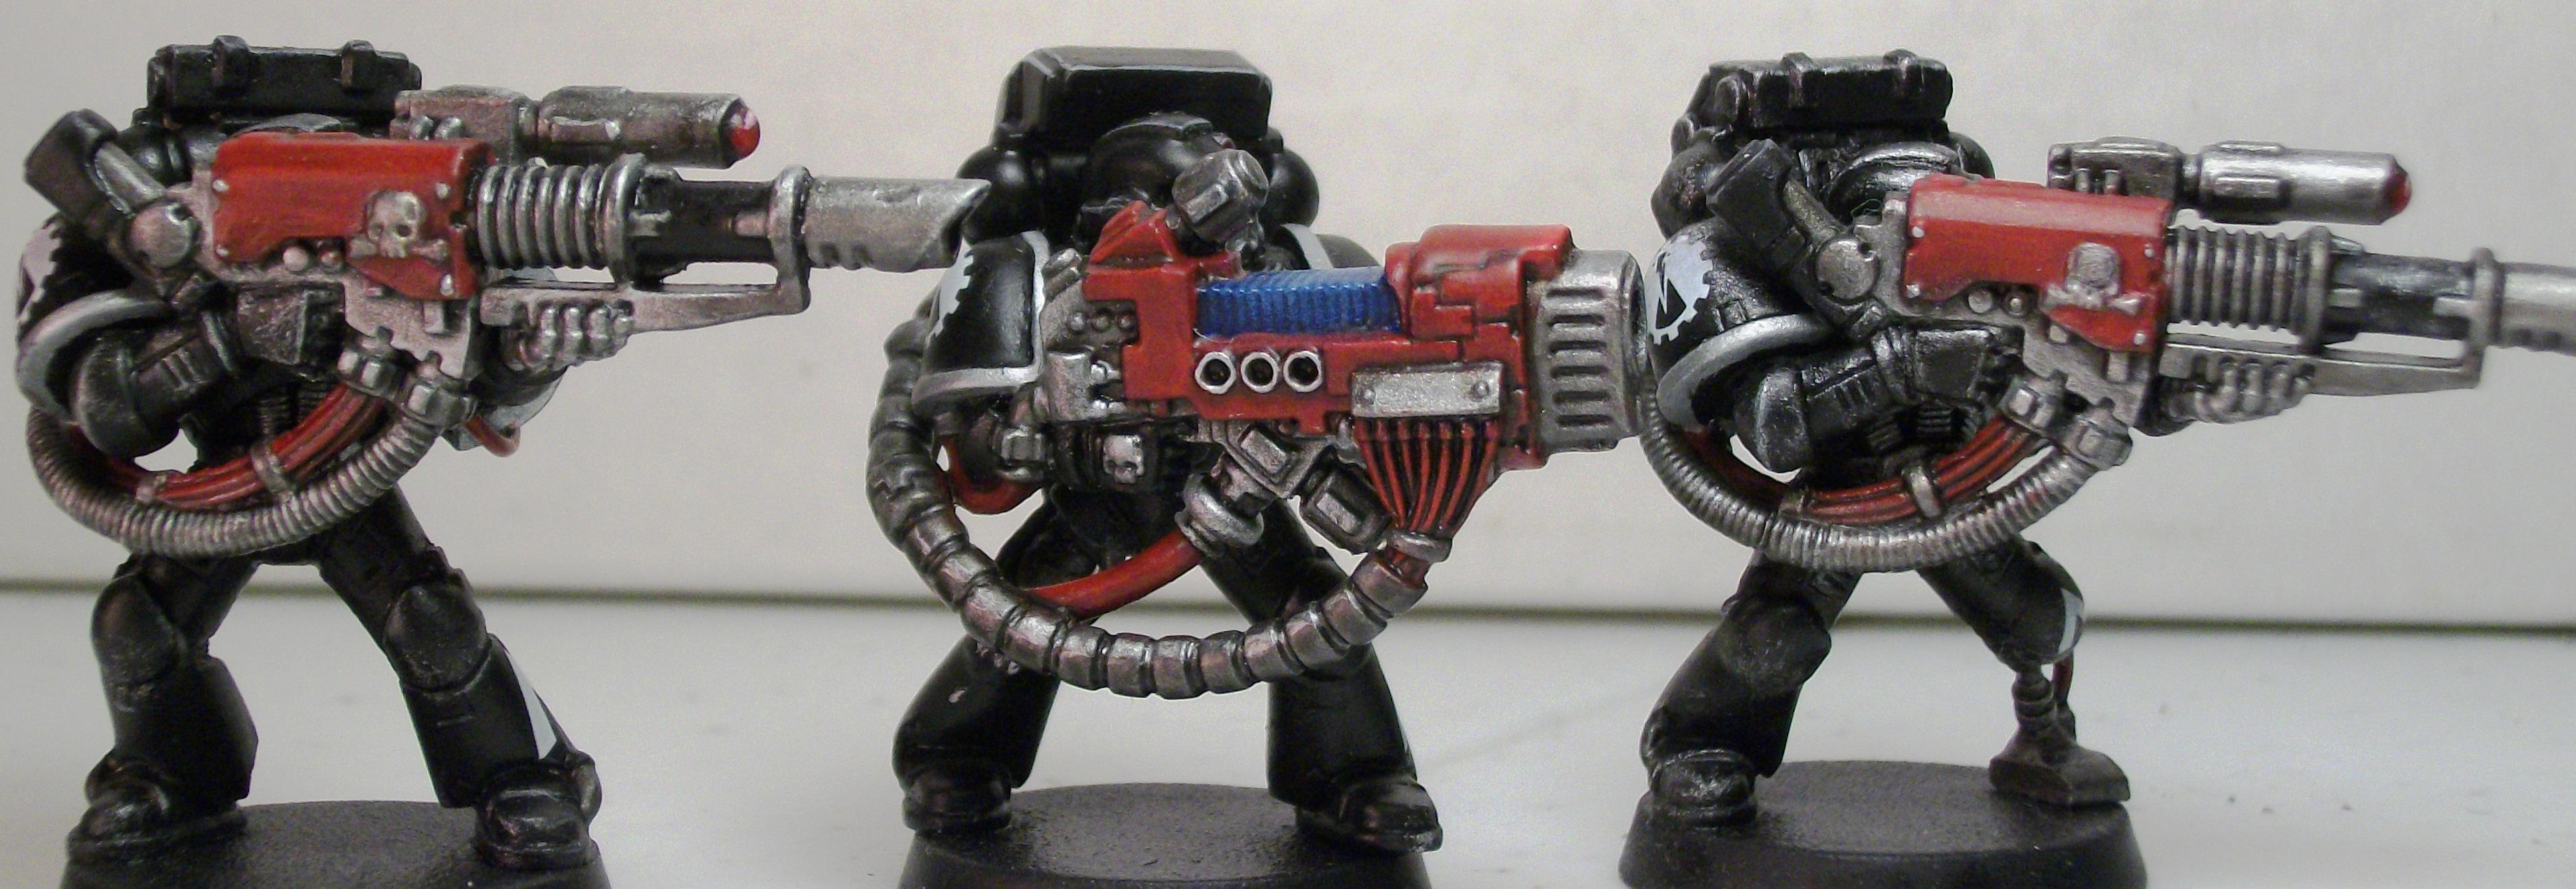 Cannon, Devastator, Devastators, Iron Hands, Lascannon, Plasma, Space Marines